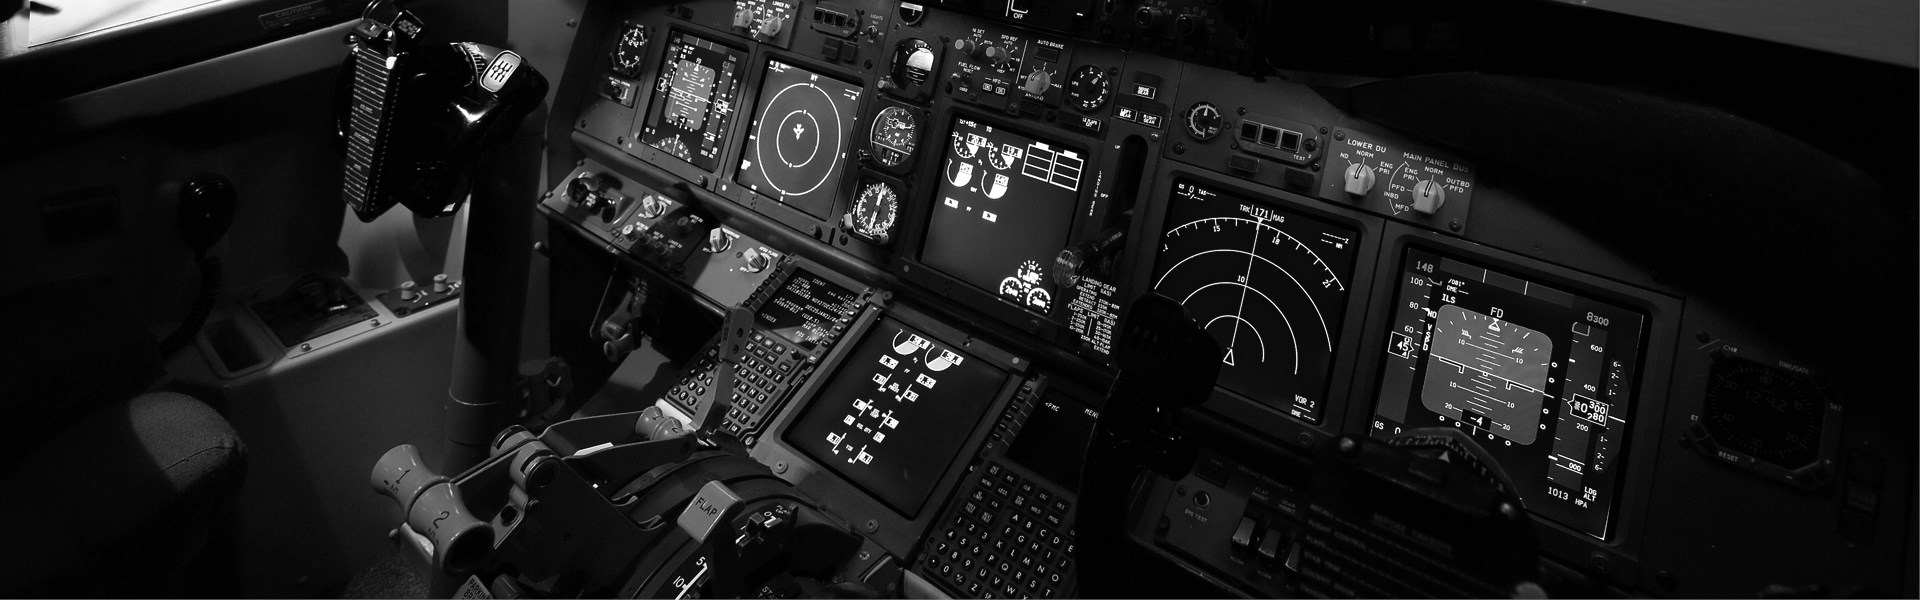 Avionics & Aircraft Equipment